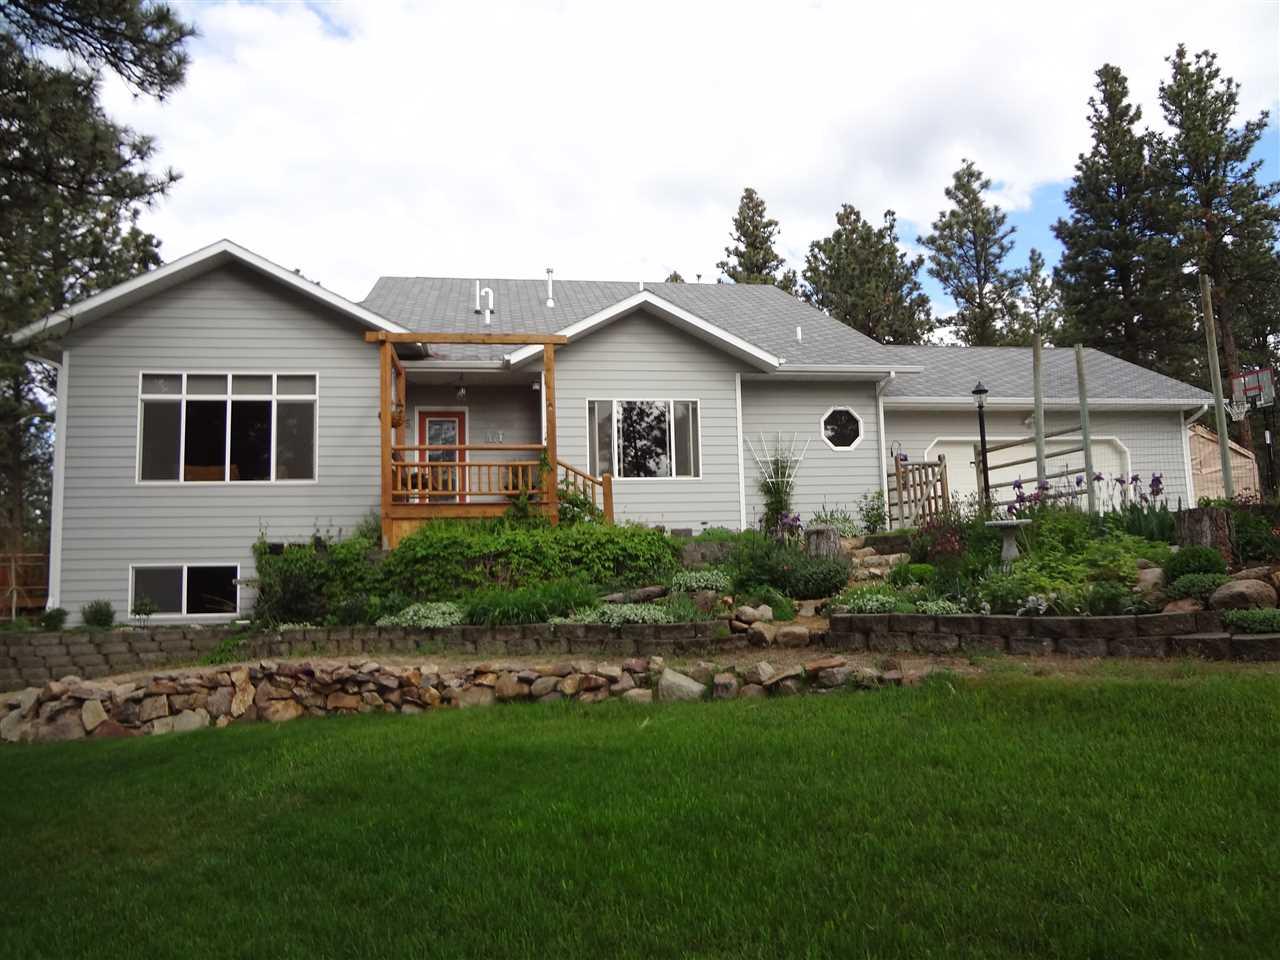 Real Estate for Sale, ListingId: 32209033, Clancy,MT59634